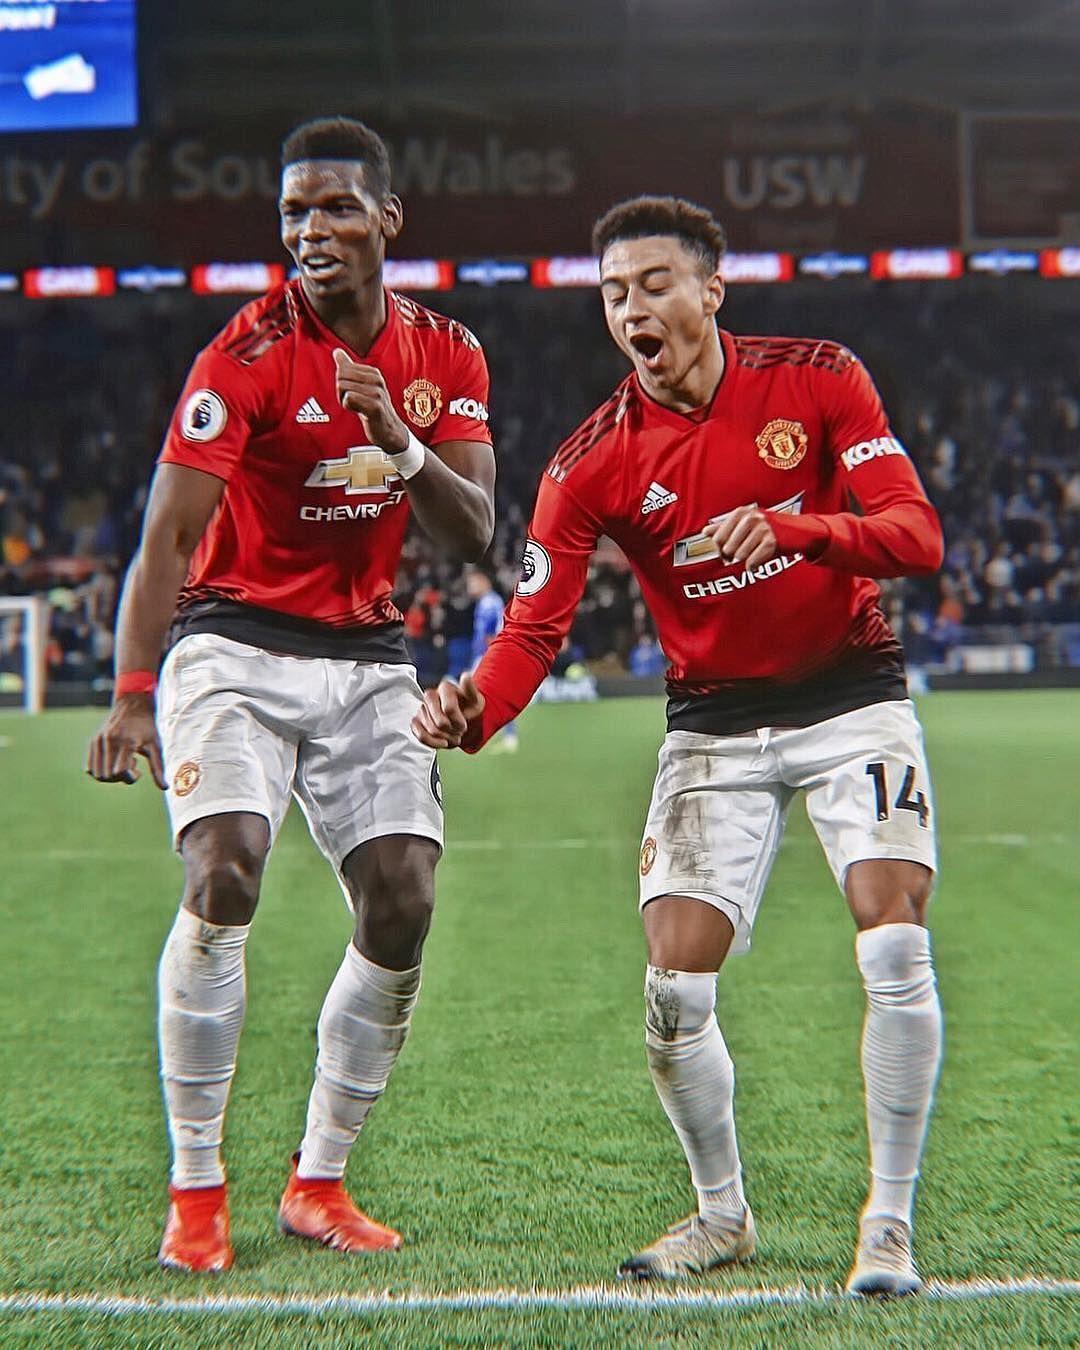 List of Good Looking Manchester United Wallpapers Pogba @paulpogba @jesselingard @jlingz - - - - - - #mufc #manchesterunited #mourinho #davesaves #lindelof #darmian #nemanjamatic…